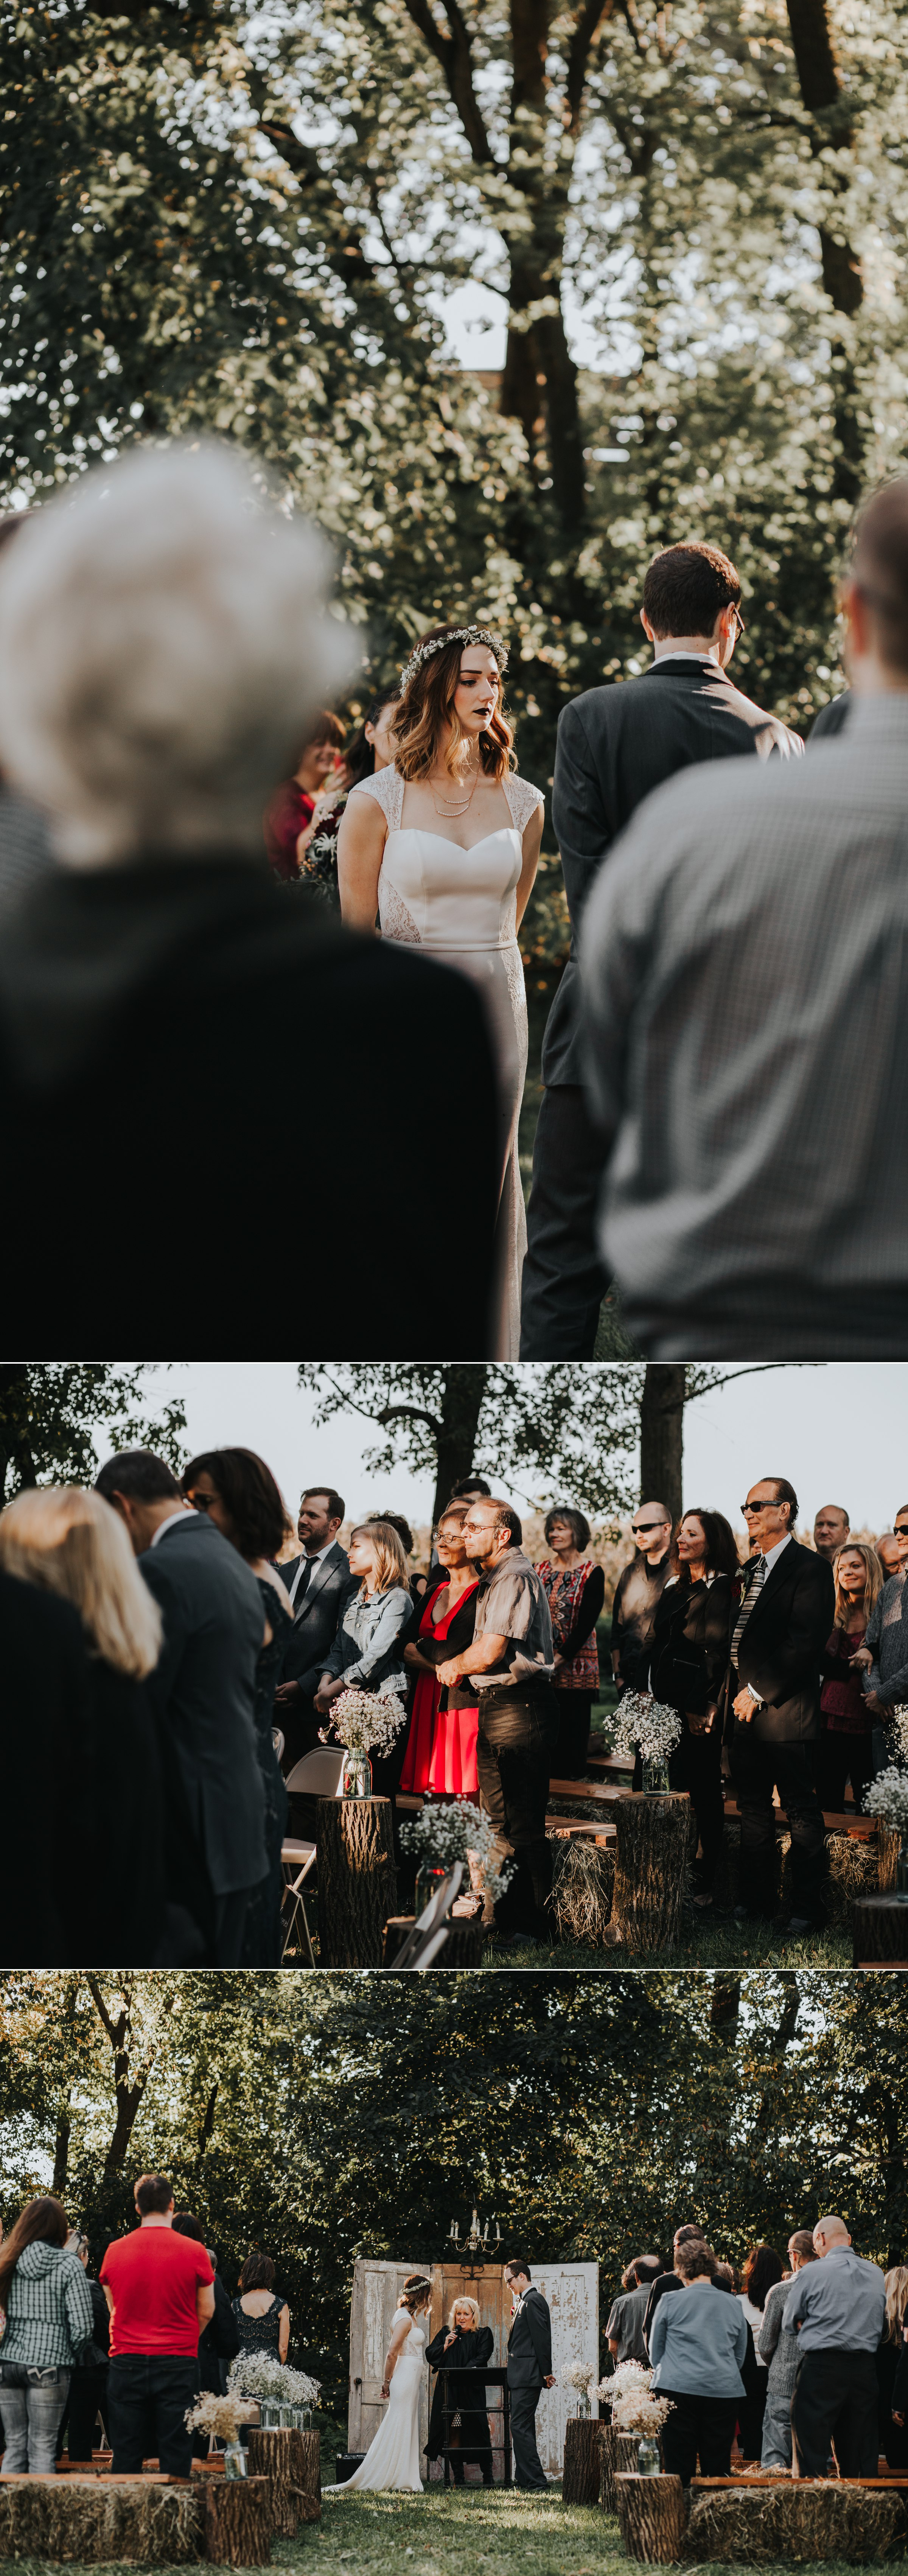 caroline and taylor minneapolis minnesota texas austin dallas houston wedding elopement destination intimate adventurous couple best photographer_0234.jpg